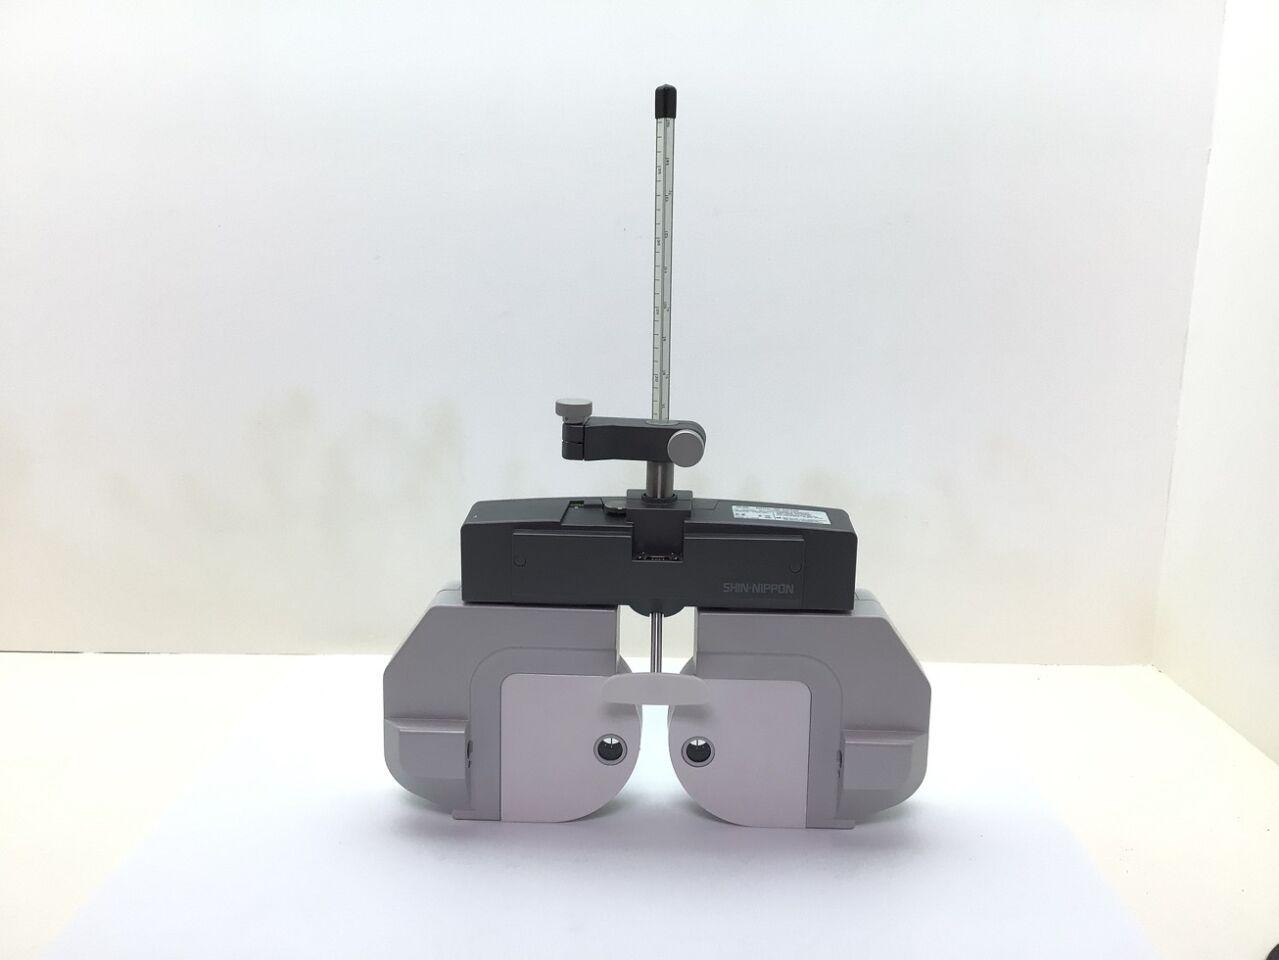 SHIN-NIPPON DR-900 / DR-900TC / LCD-900P Autorefractor